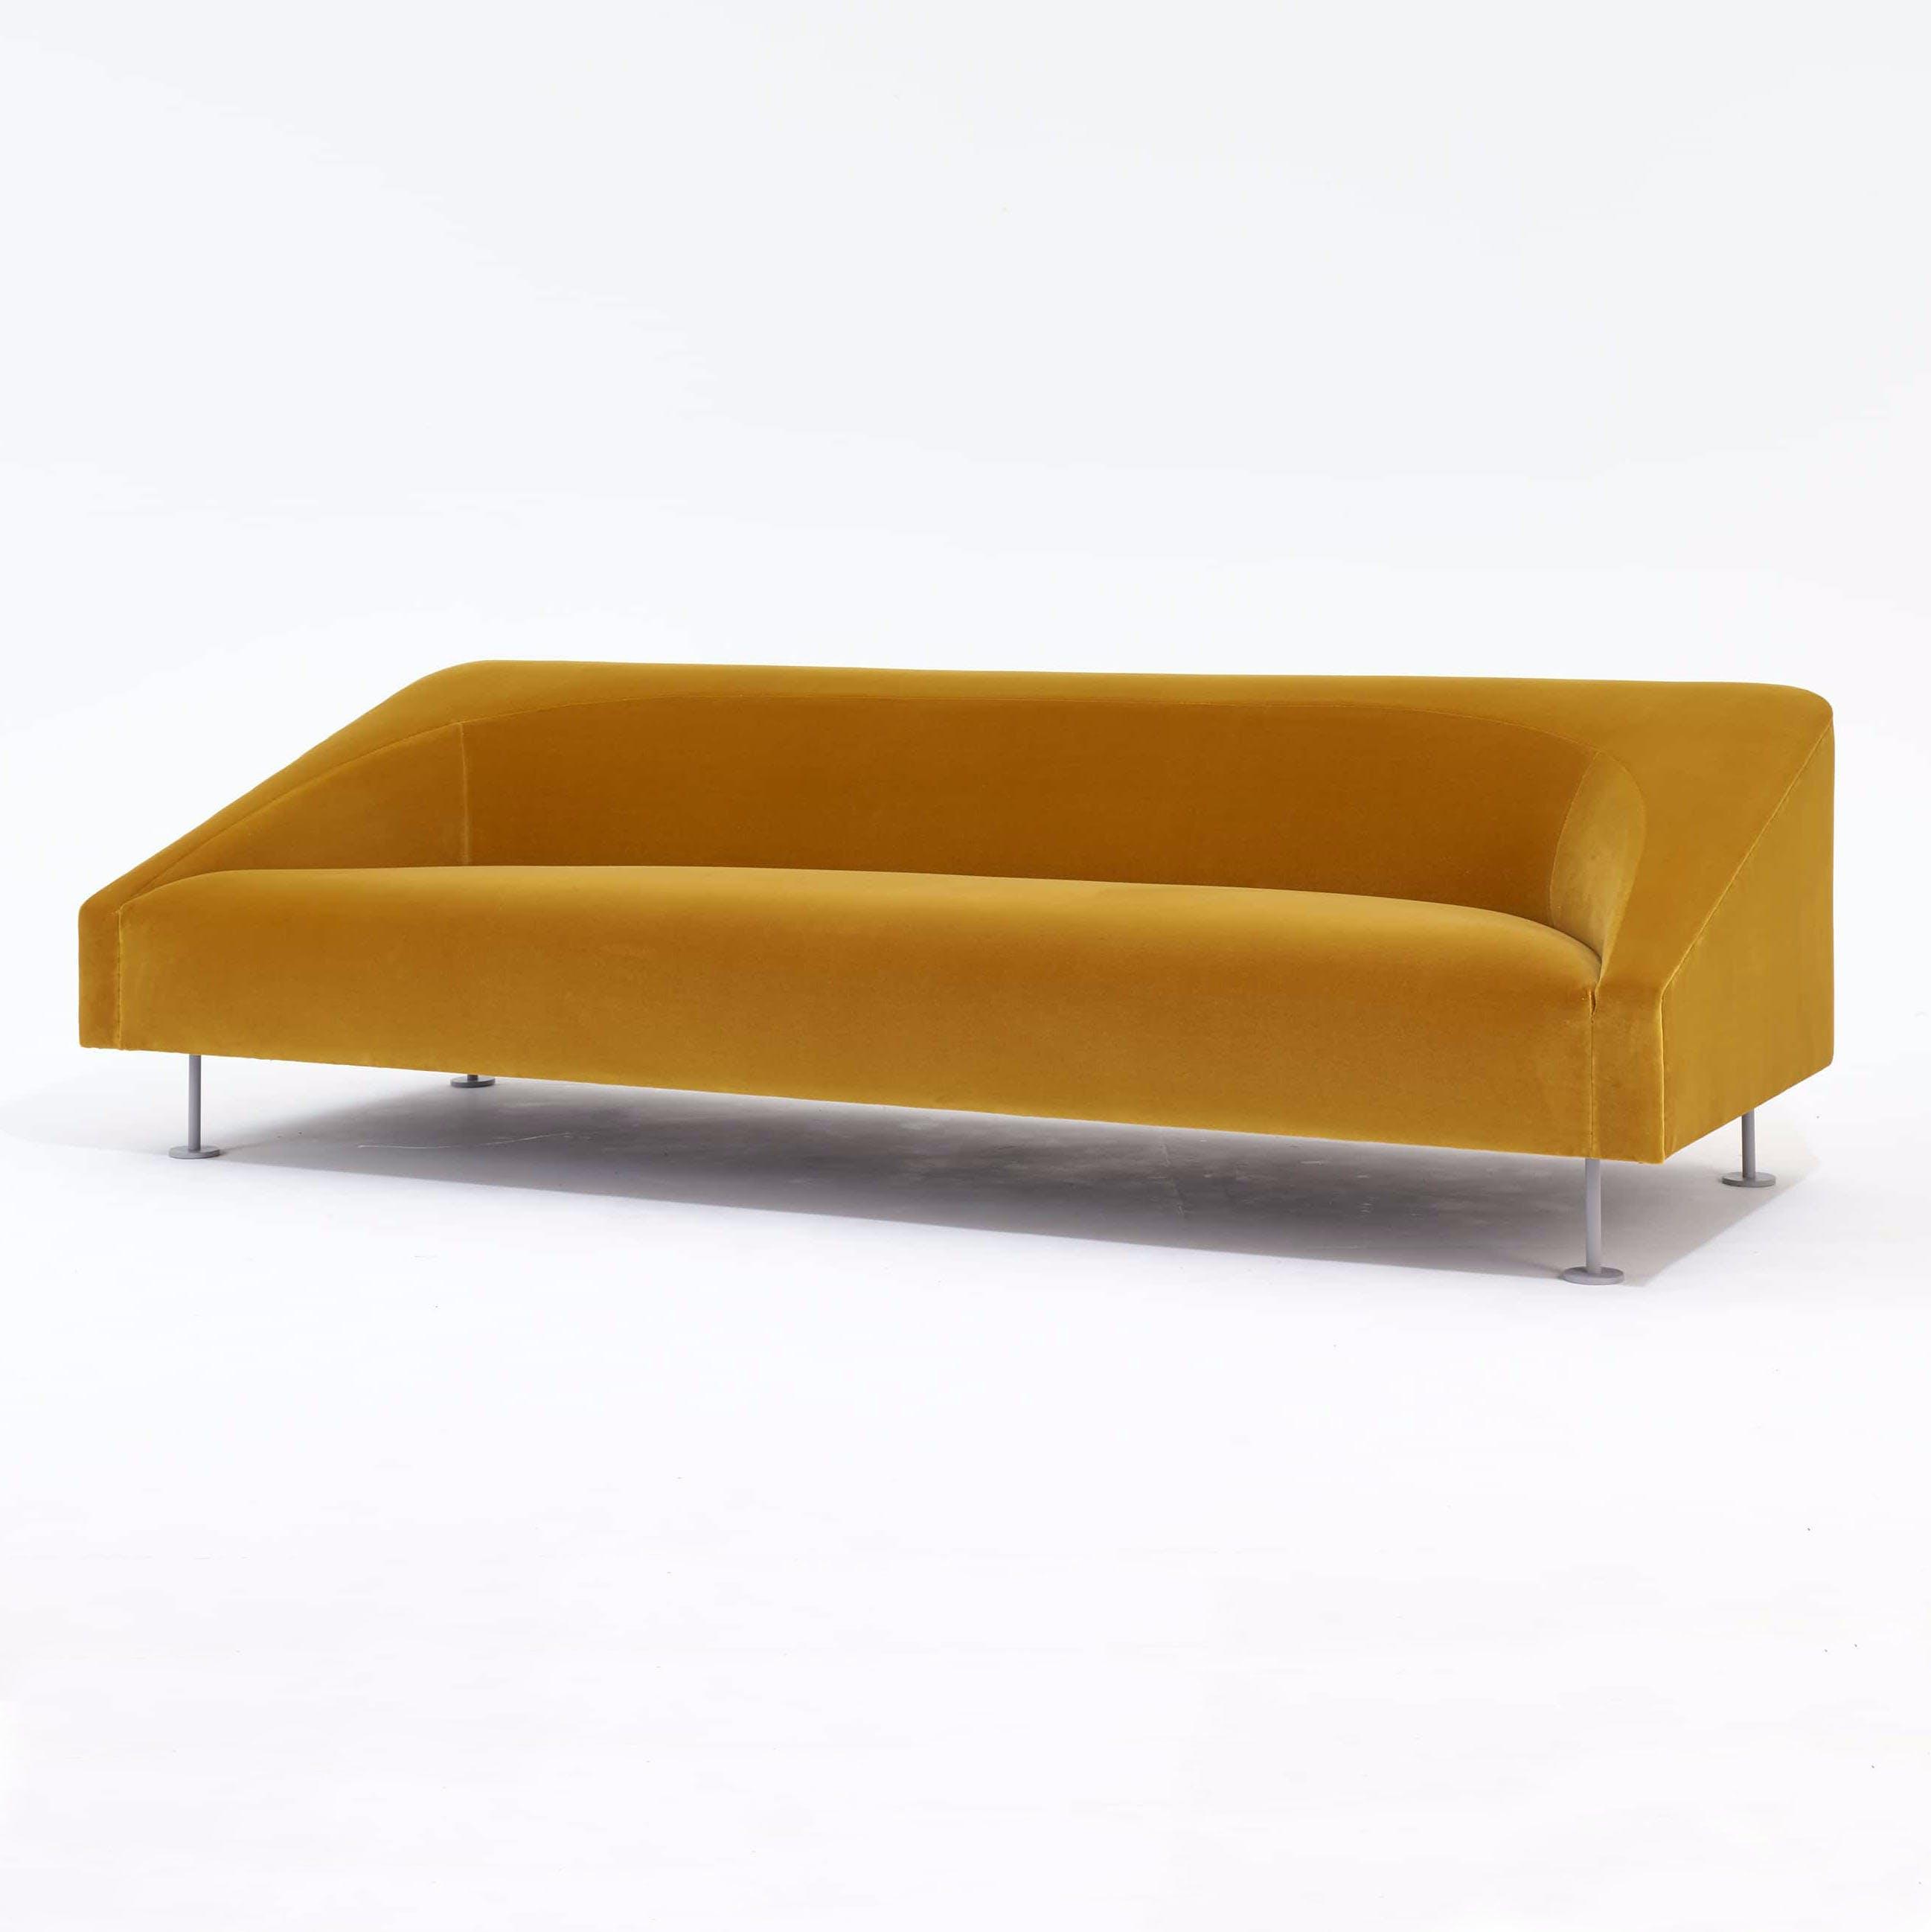 Scp-furniture-linear-sofa-three-seat-angle-thumb-haute-living